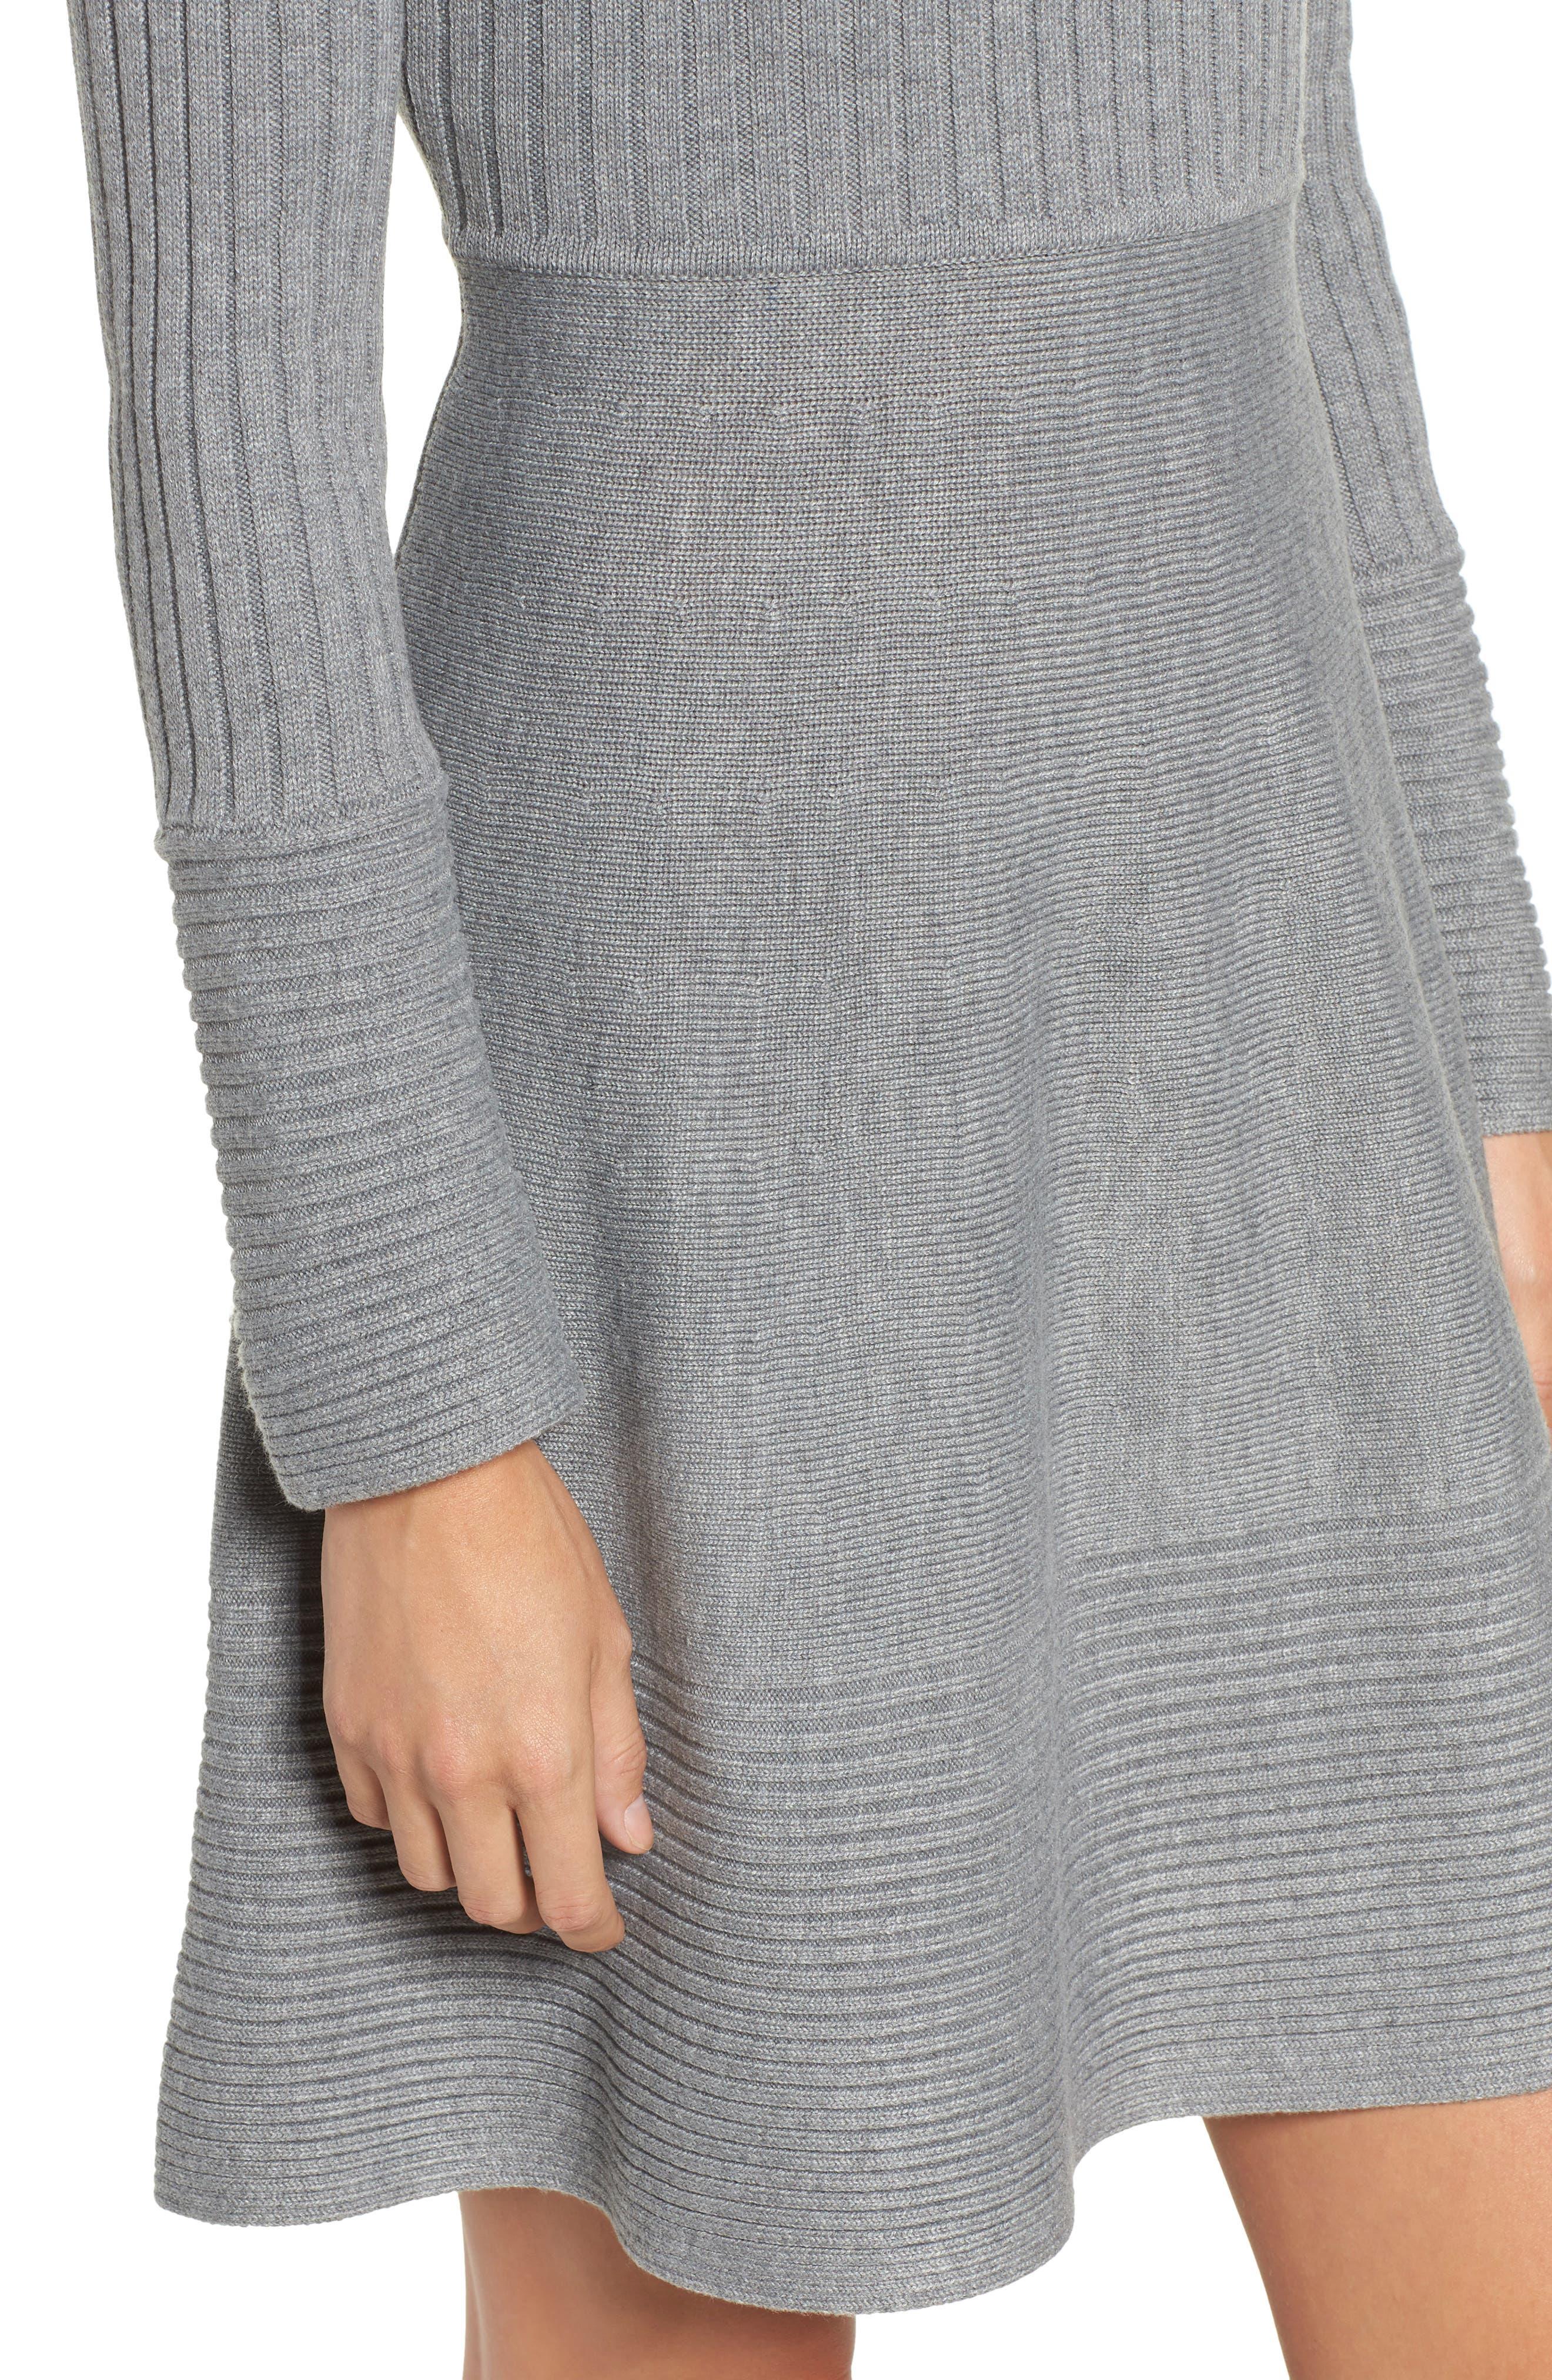 ELIZA J, Turtleneck Sweater Dress, Alternate thumbnail 5, color, GREY